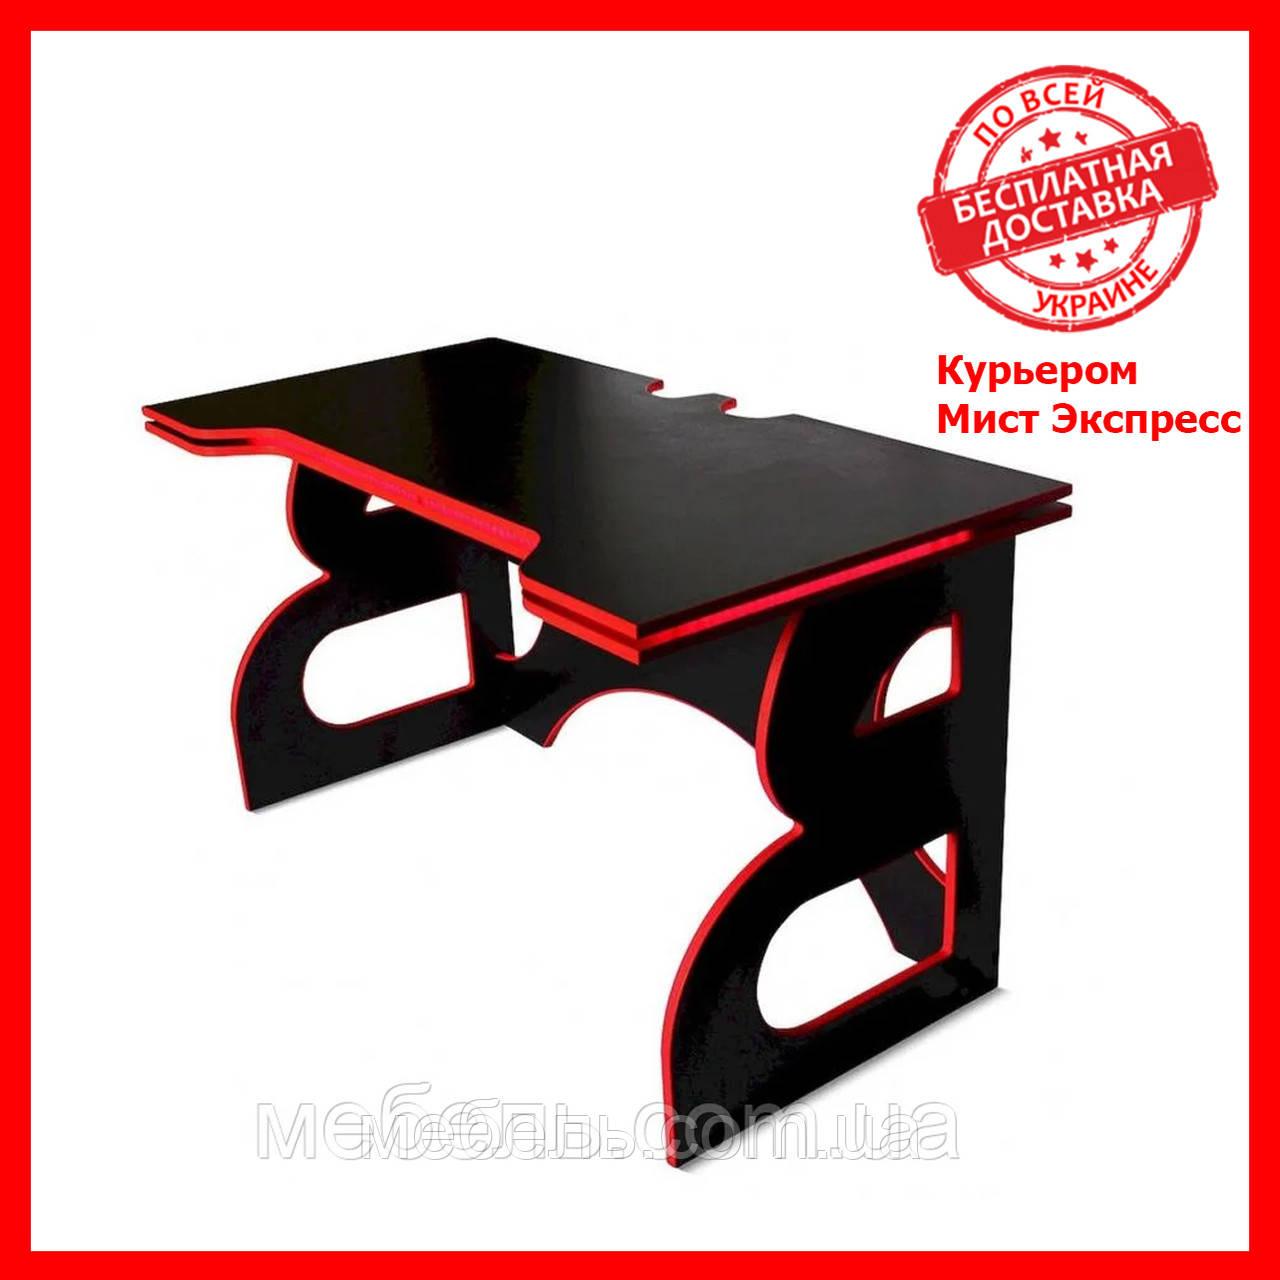 Компьютерный стол Barsky Homework Game Red HG-05 с полкой HG-05 /ПК-01 1400*700